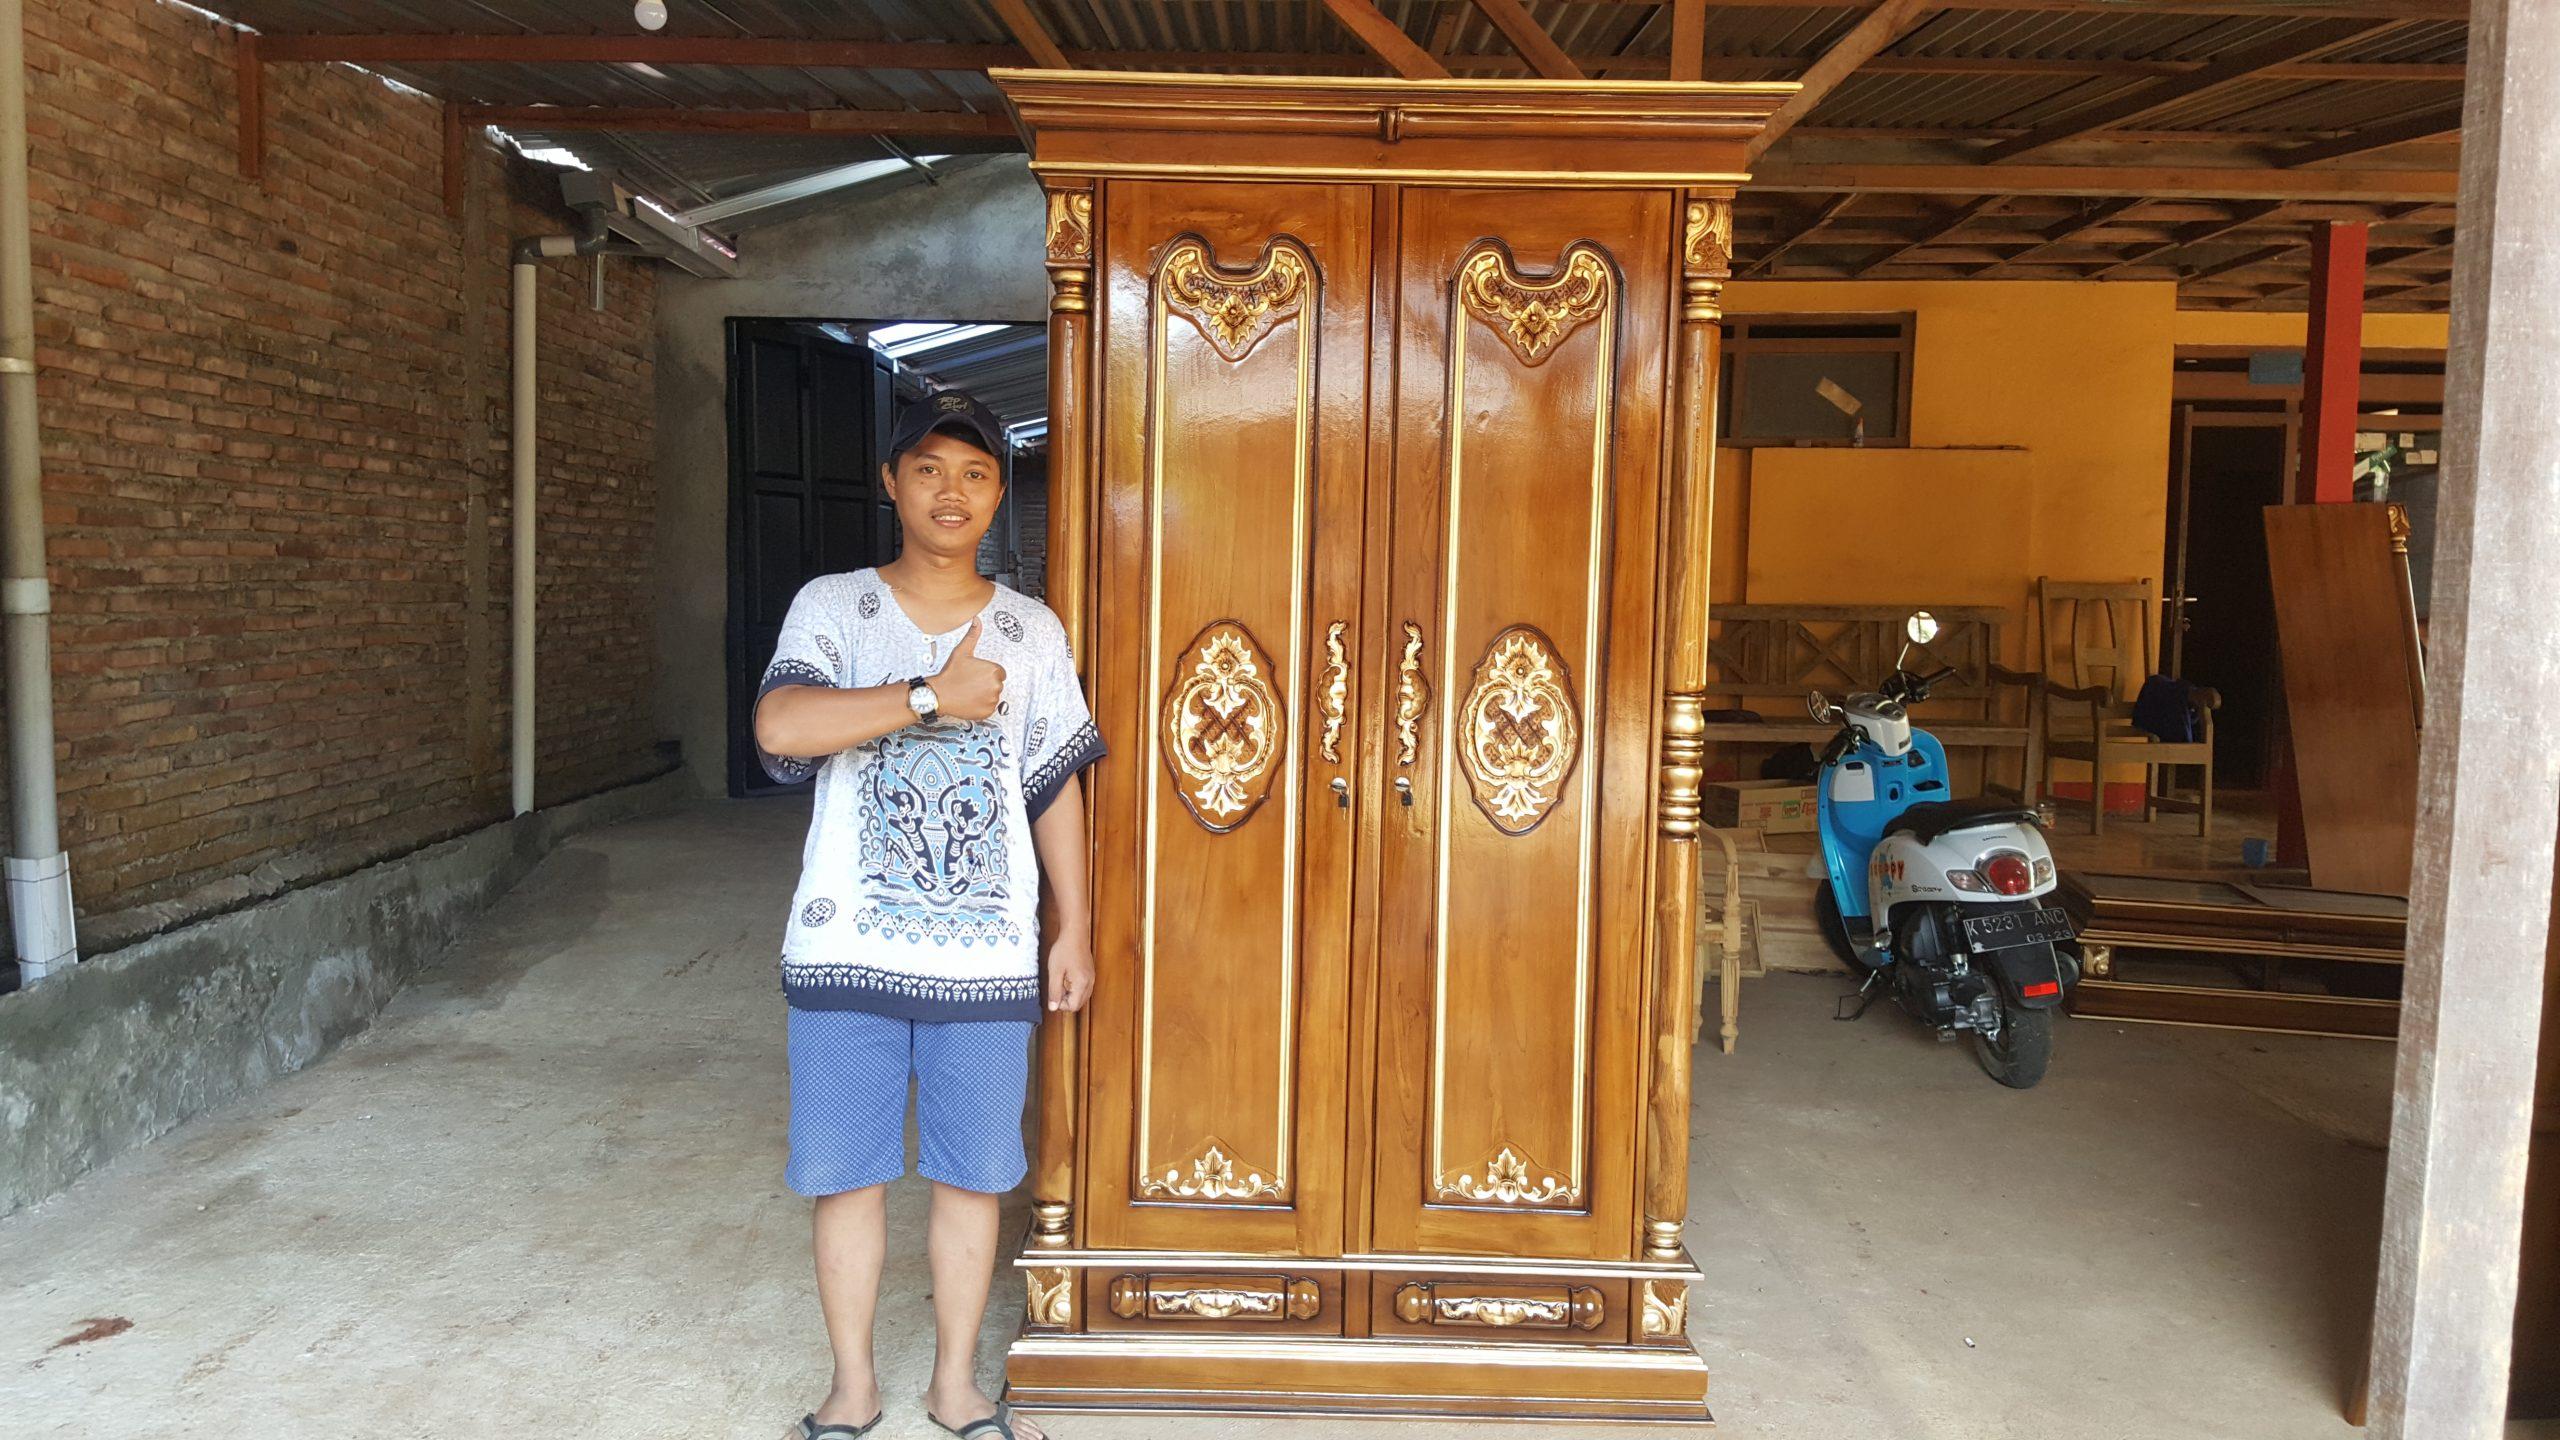 tempat-tidur-set-kayu-jati-mewah-ukir-jepara (9)